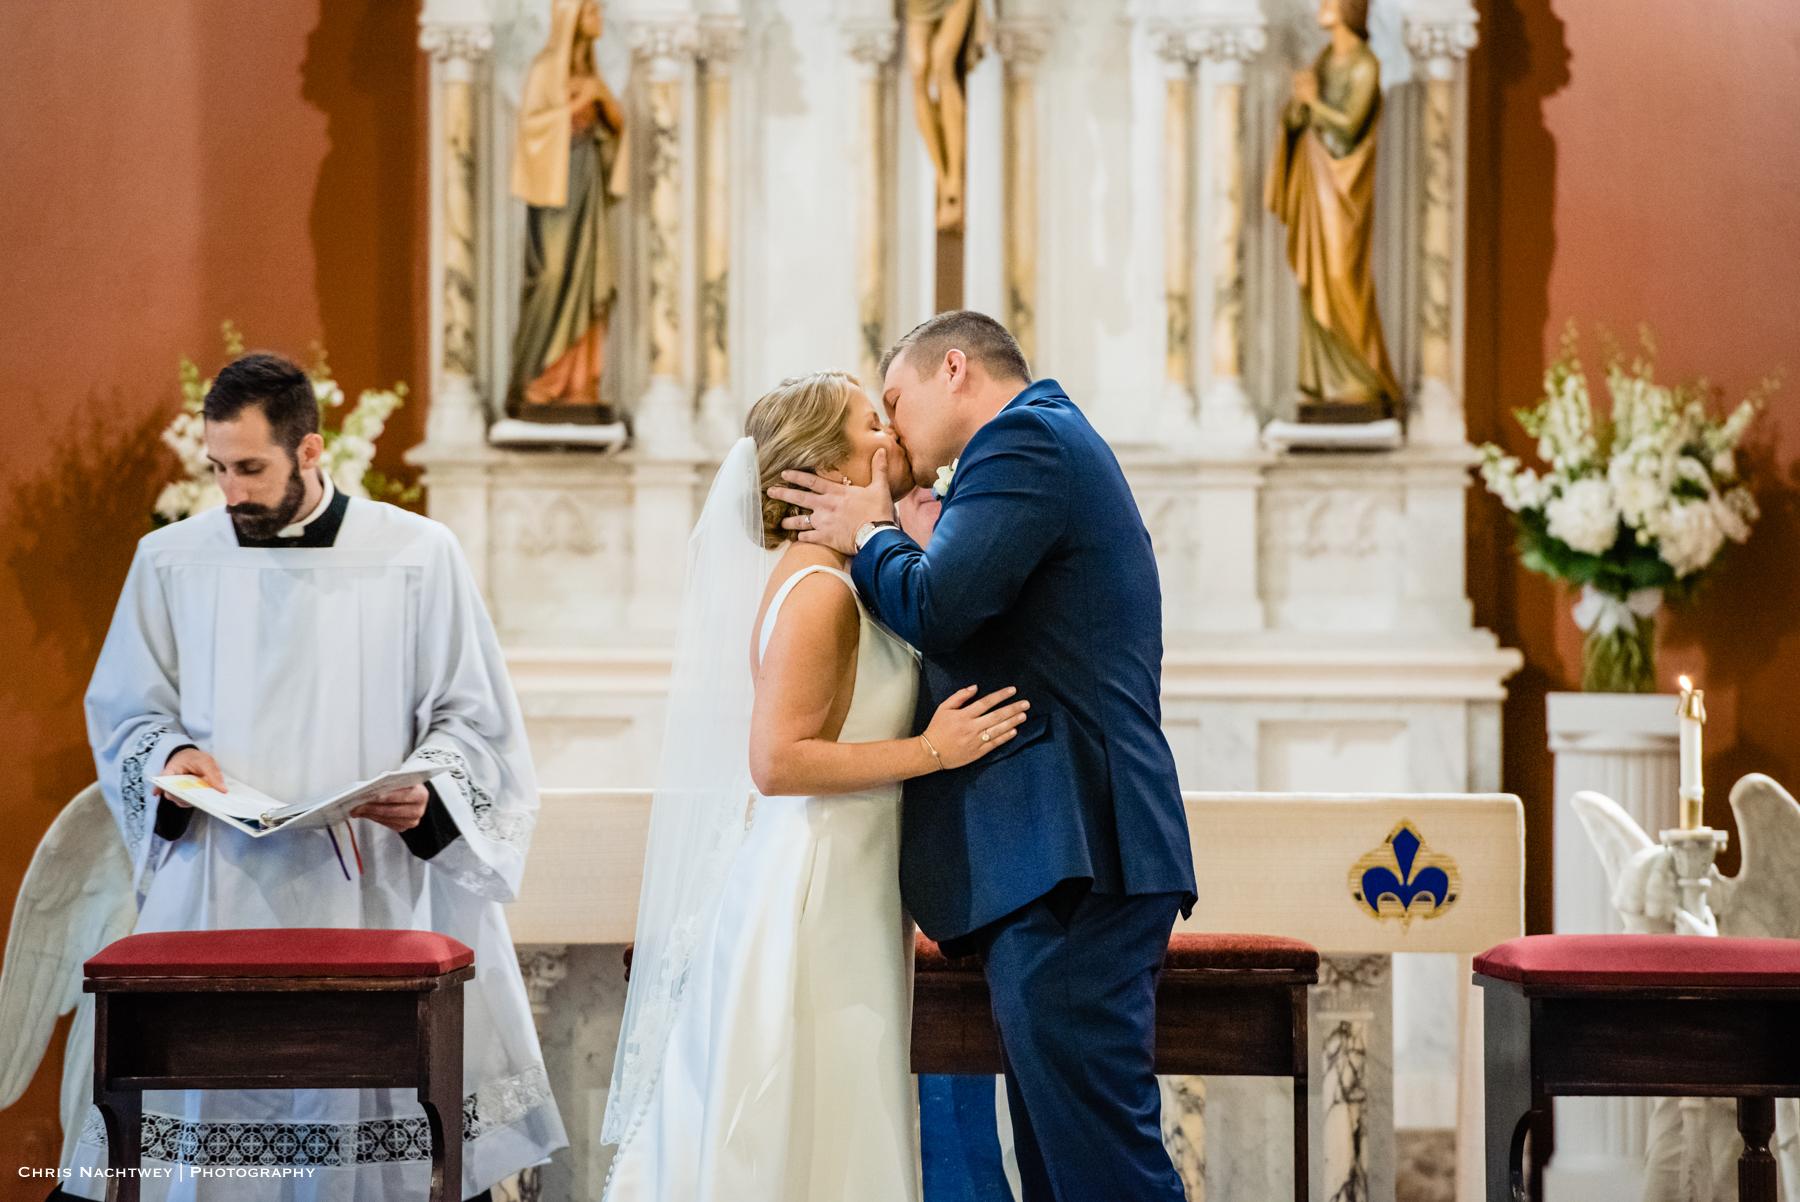 photos-wedding-haley-mansion-mystic-ct-chris-nachtwey-photography-2019-14.jpg